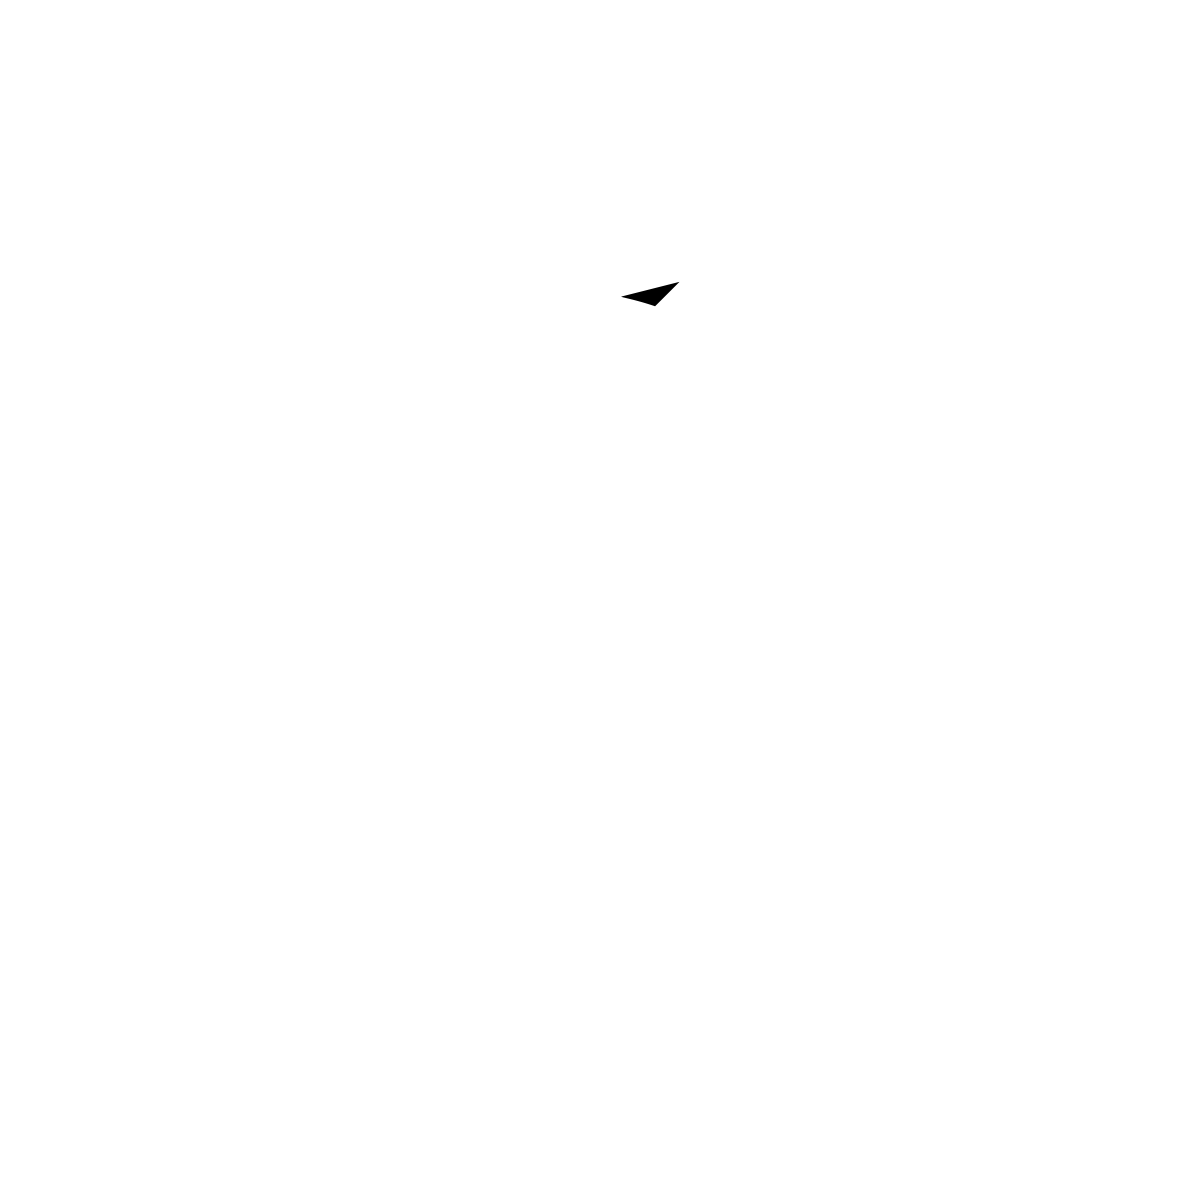 https://www.swanseadentistry.com/wp-content/uploads/2015/11/laser-dentistry-white.png